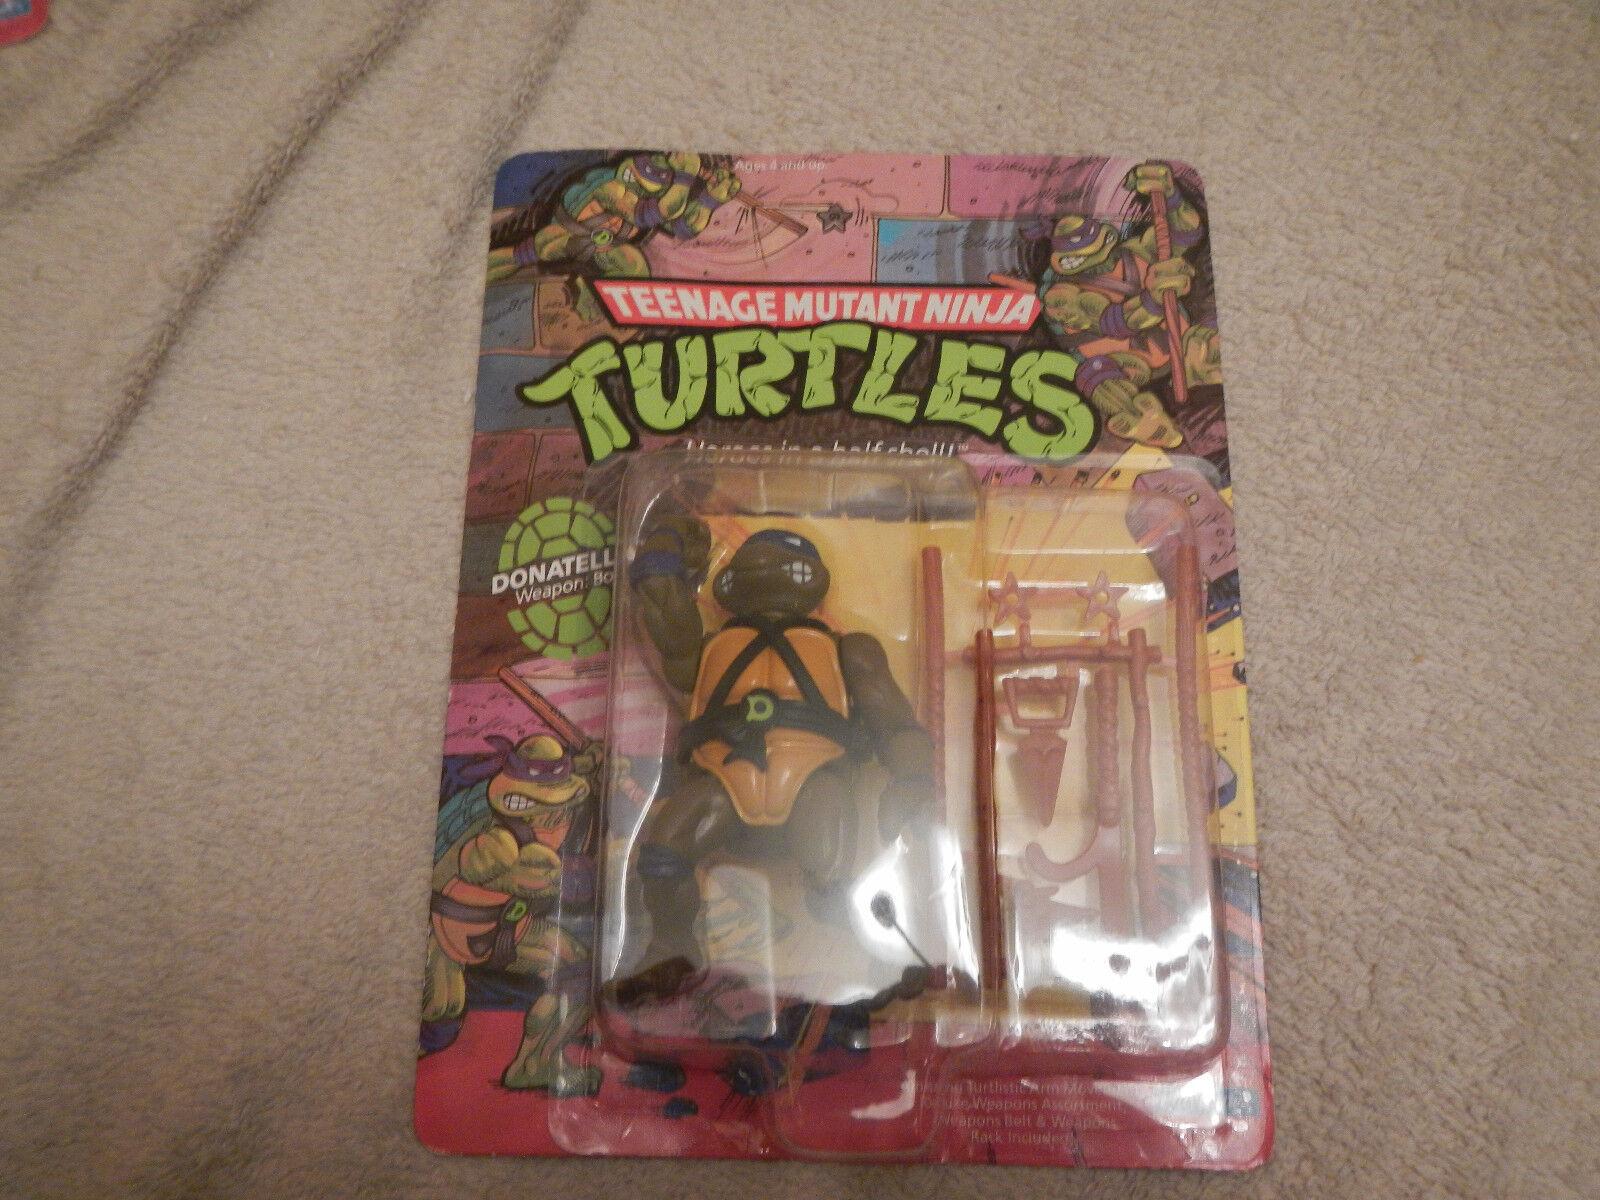 1988 1988 1988 Teenage Mutant Ninja Turtles Donatello Unpunched 846826